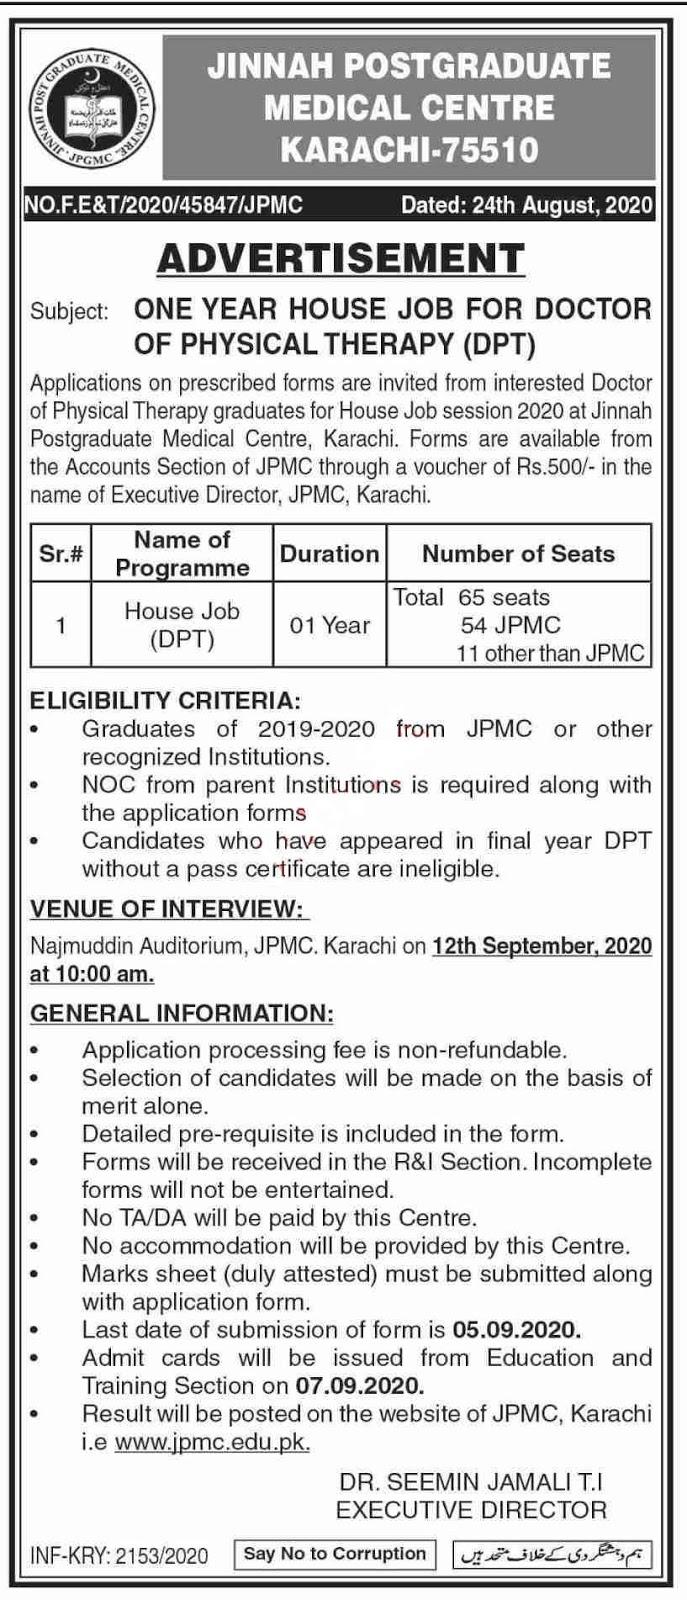 130 seats Jinnah Postgraduate Medical Centre JPMC Karachi Jobs 2020